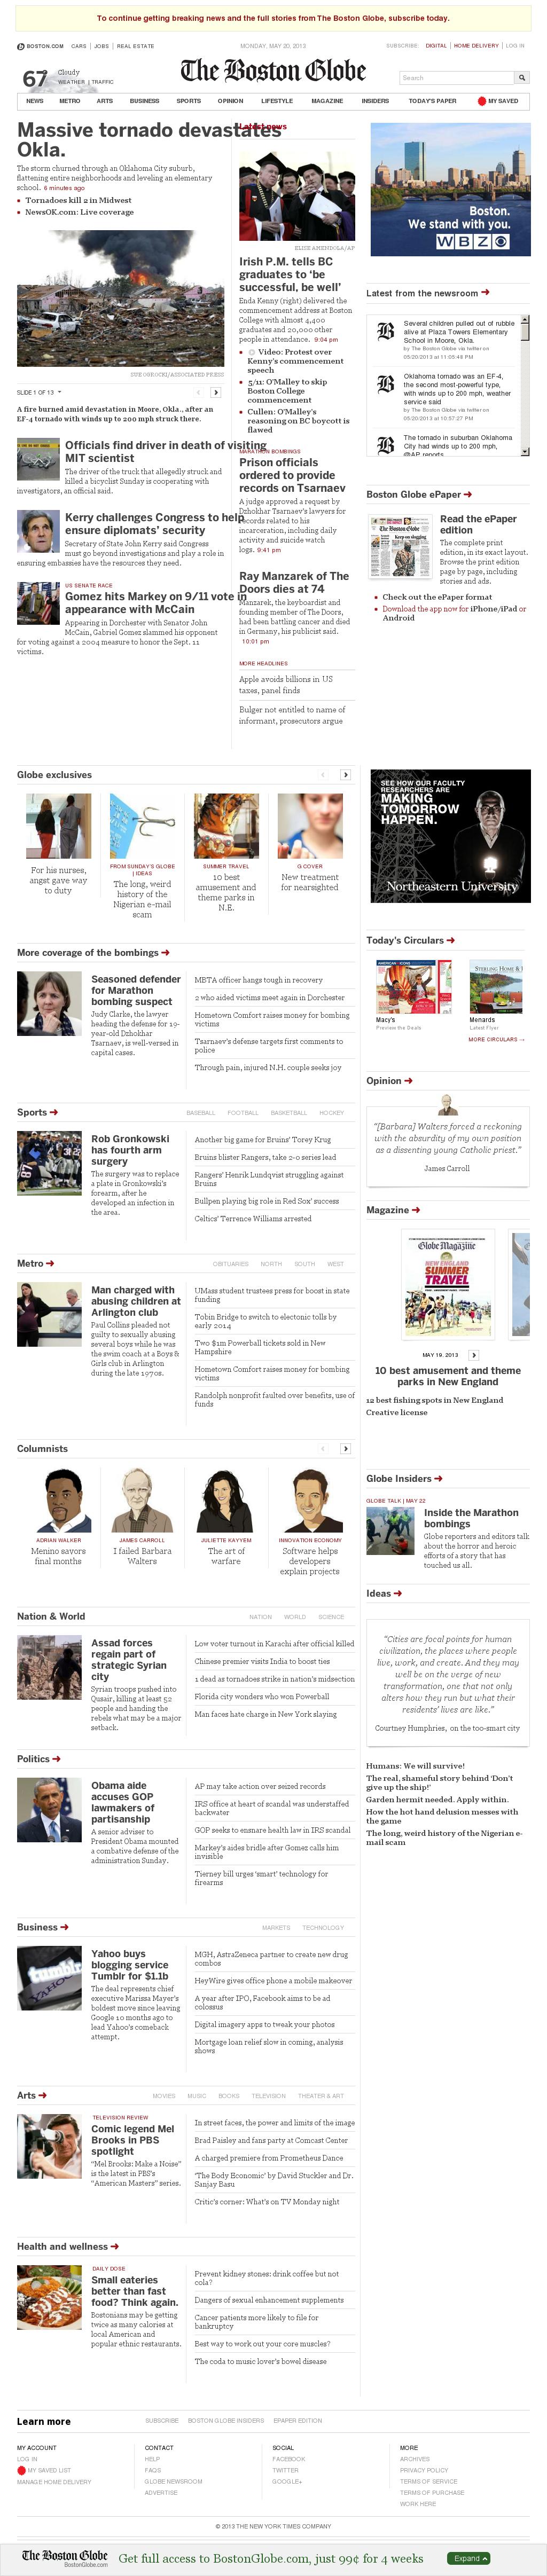 The Boston Globe at Tuesday May 21, 2013, 12:02 a.m. UTC